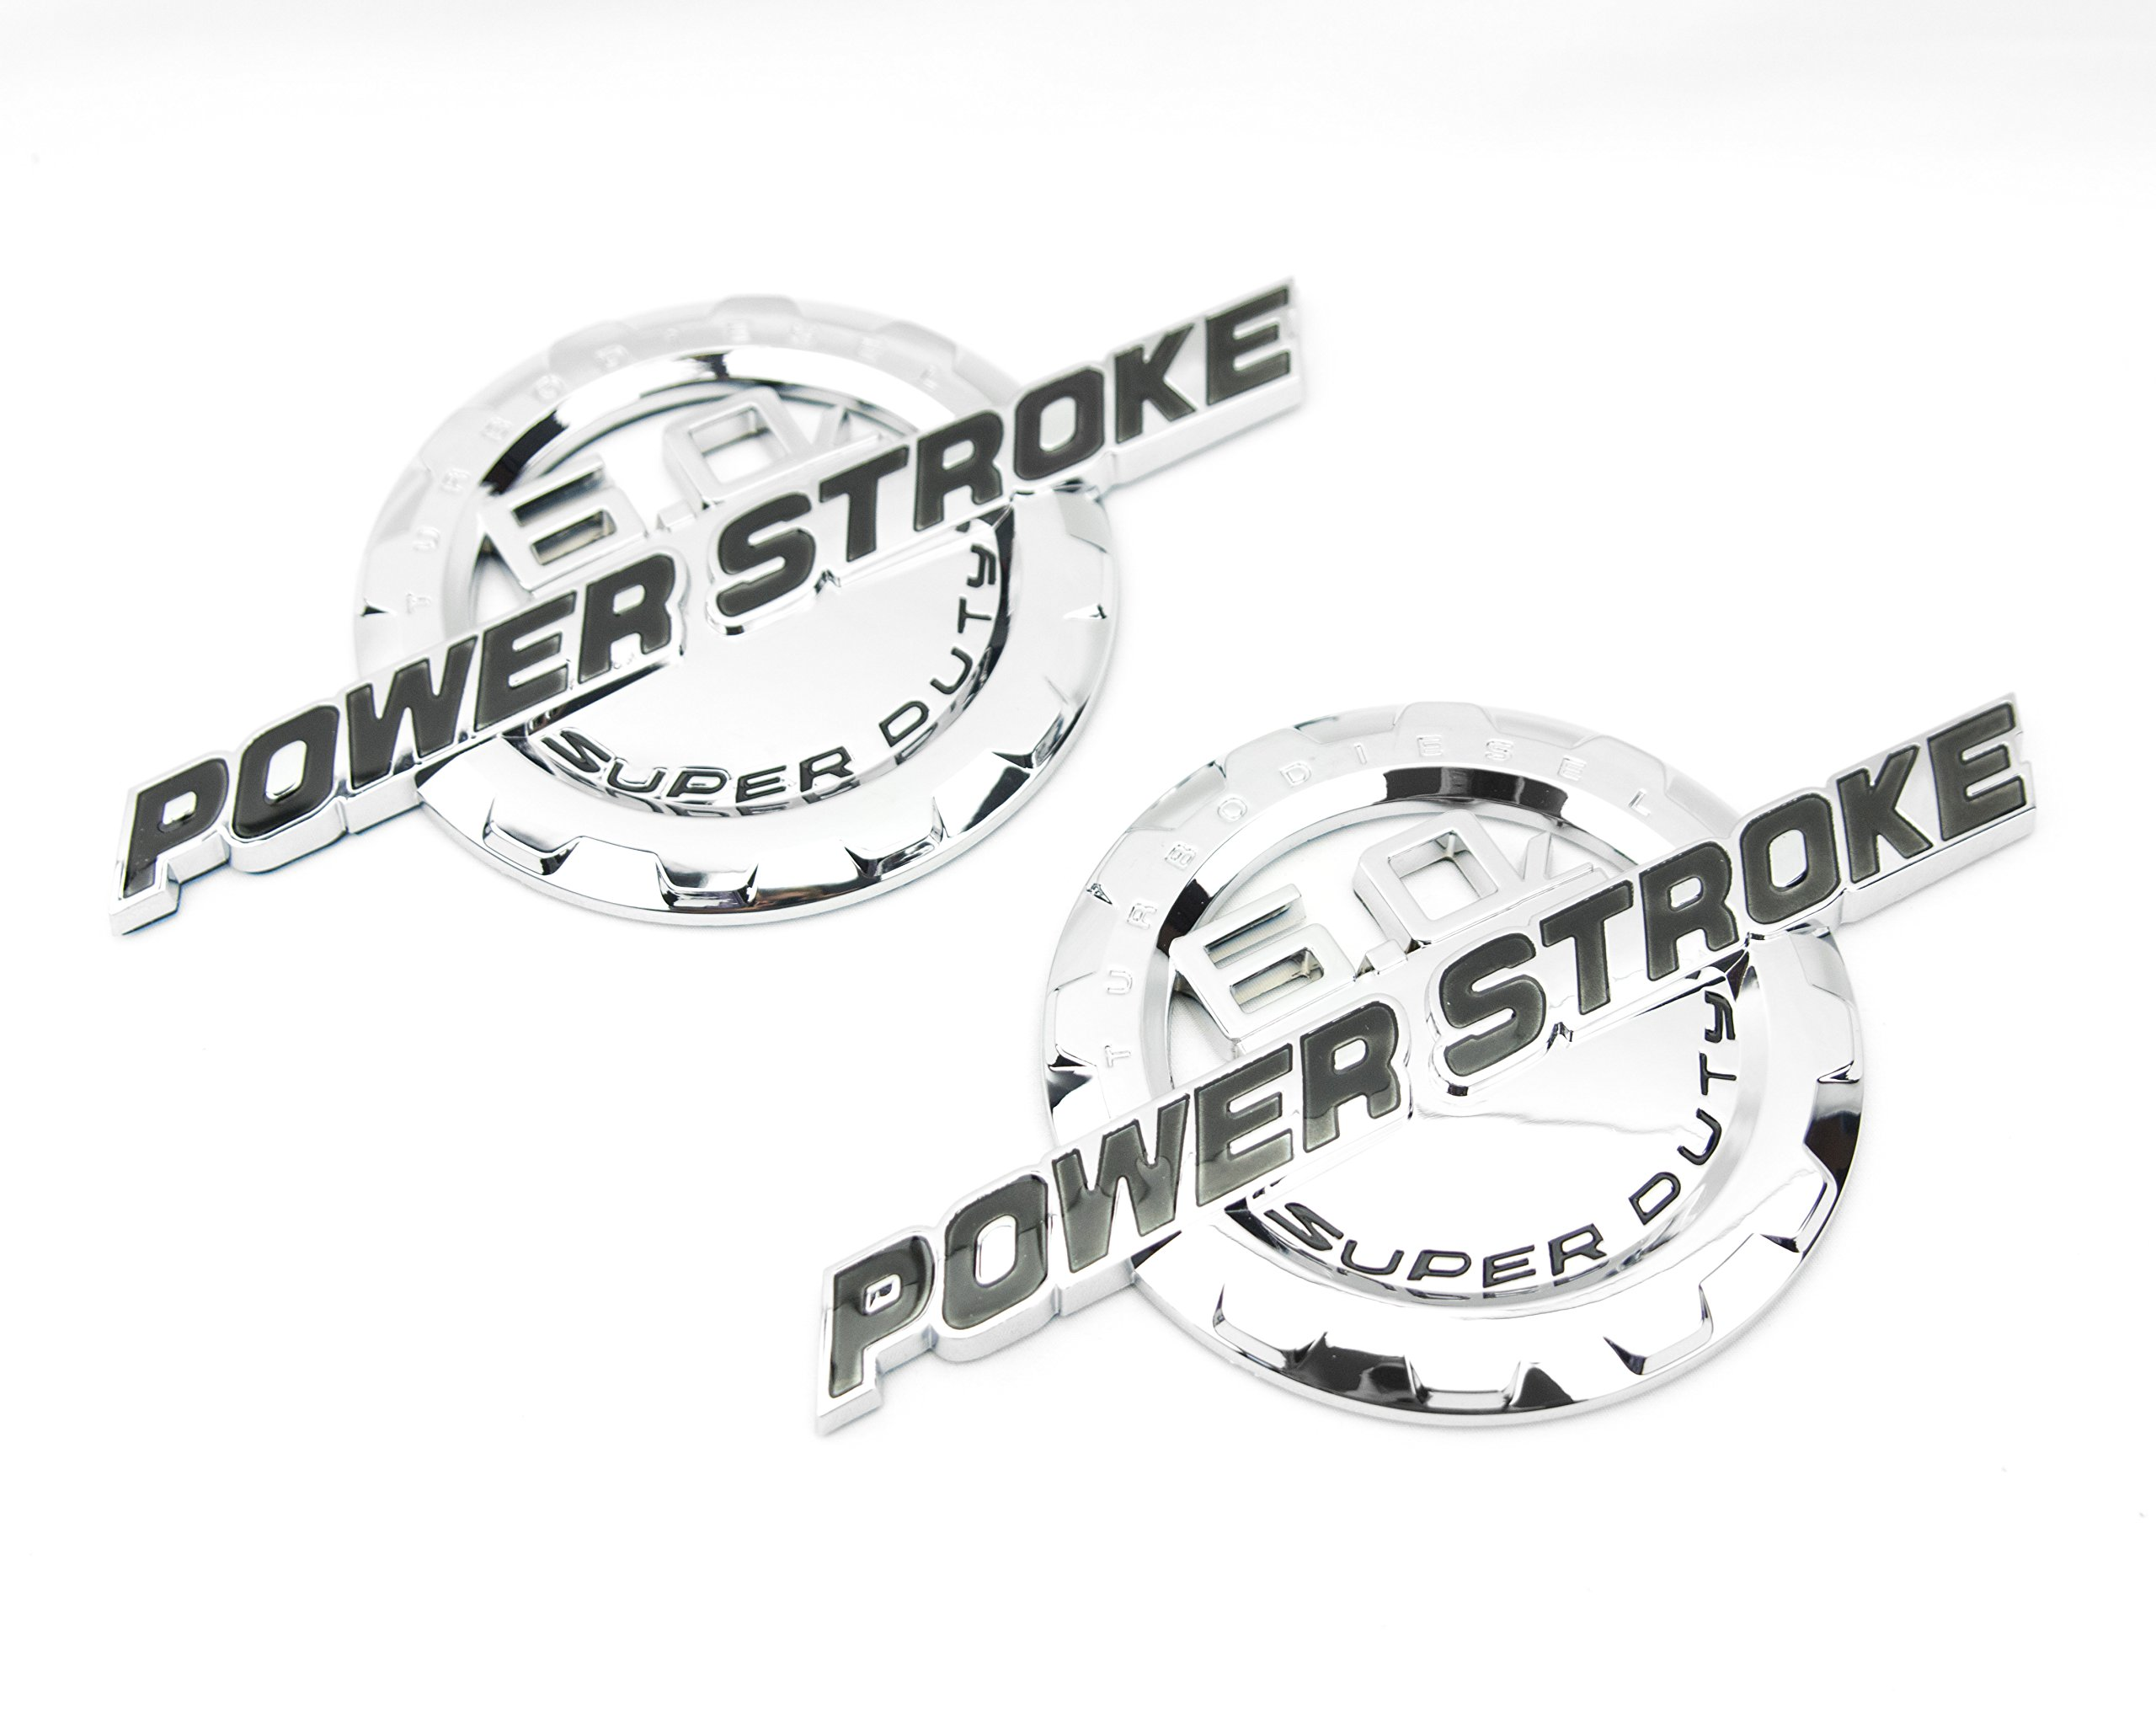 1999-2001 POWER STROKE DIESEL V8 EMBLEMS PAIR FOR SUPERDUTY SUPER DUTY 1PIECE